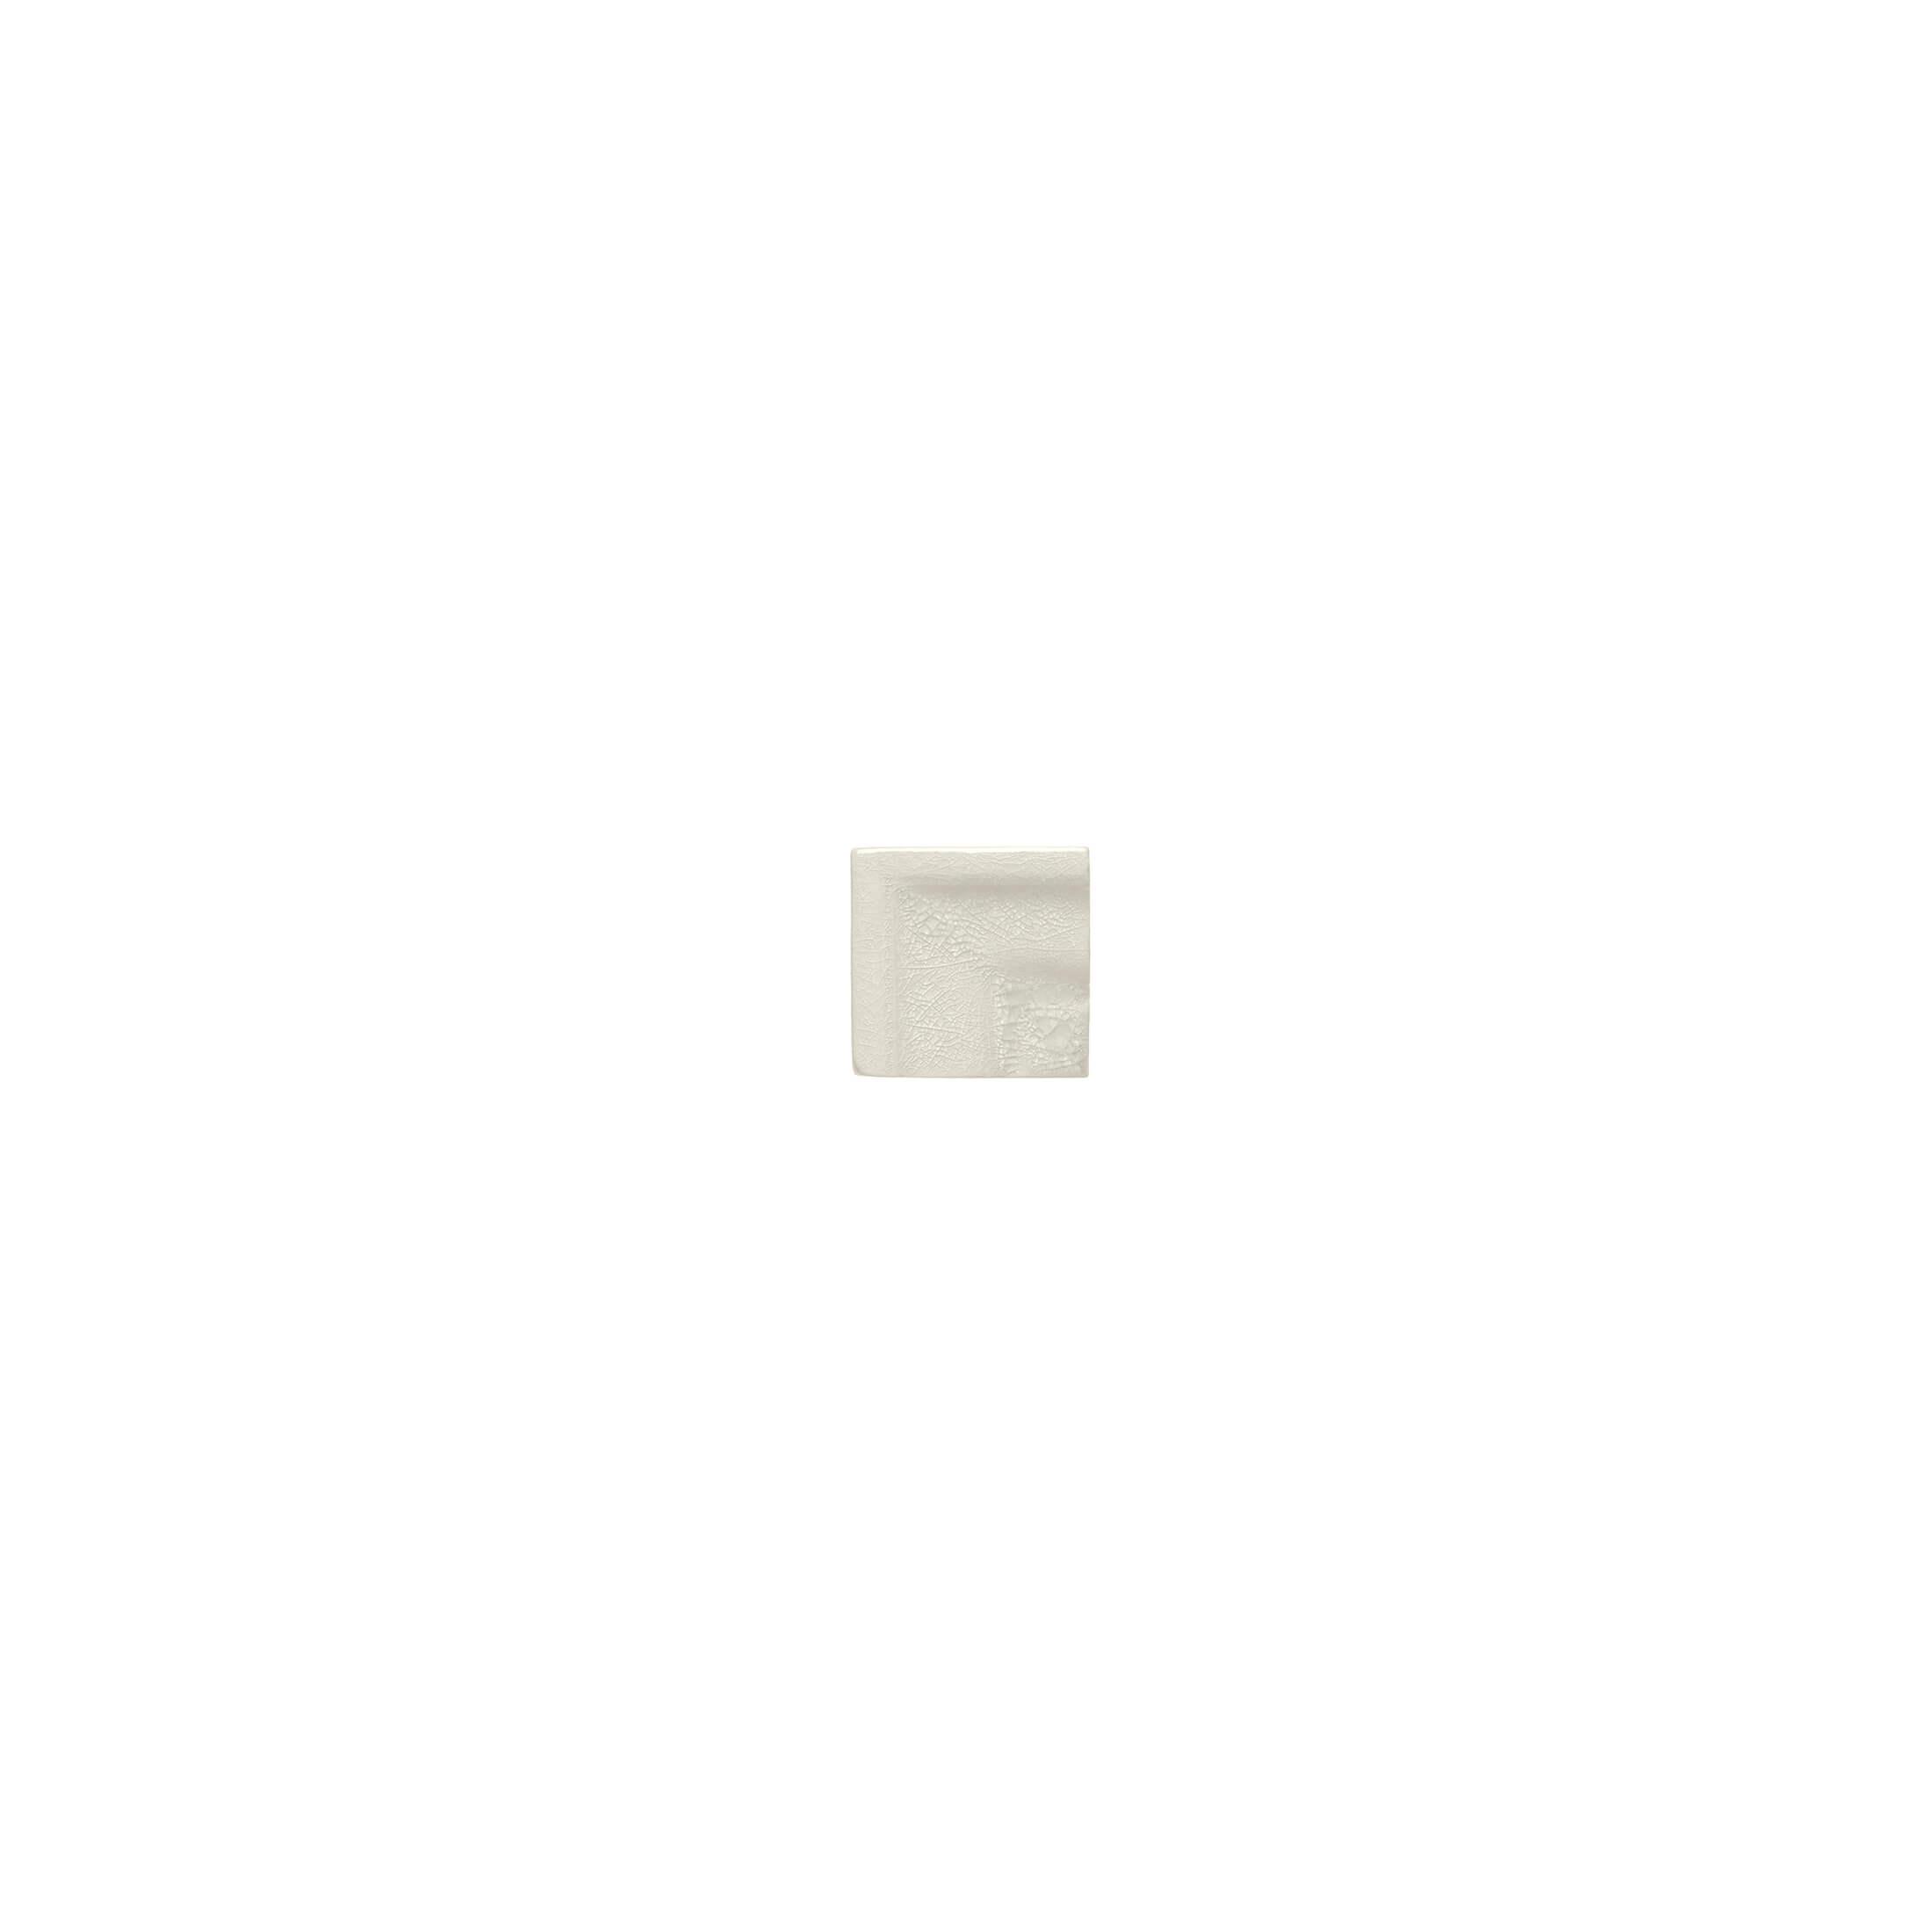 ADOC5072 - ANGULO MARCOCORNISA - 3 cm X 15 cm